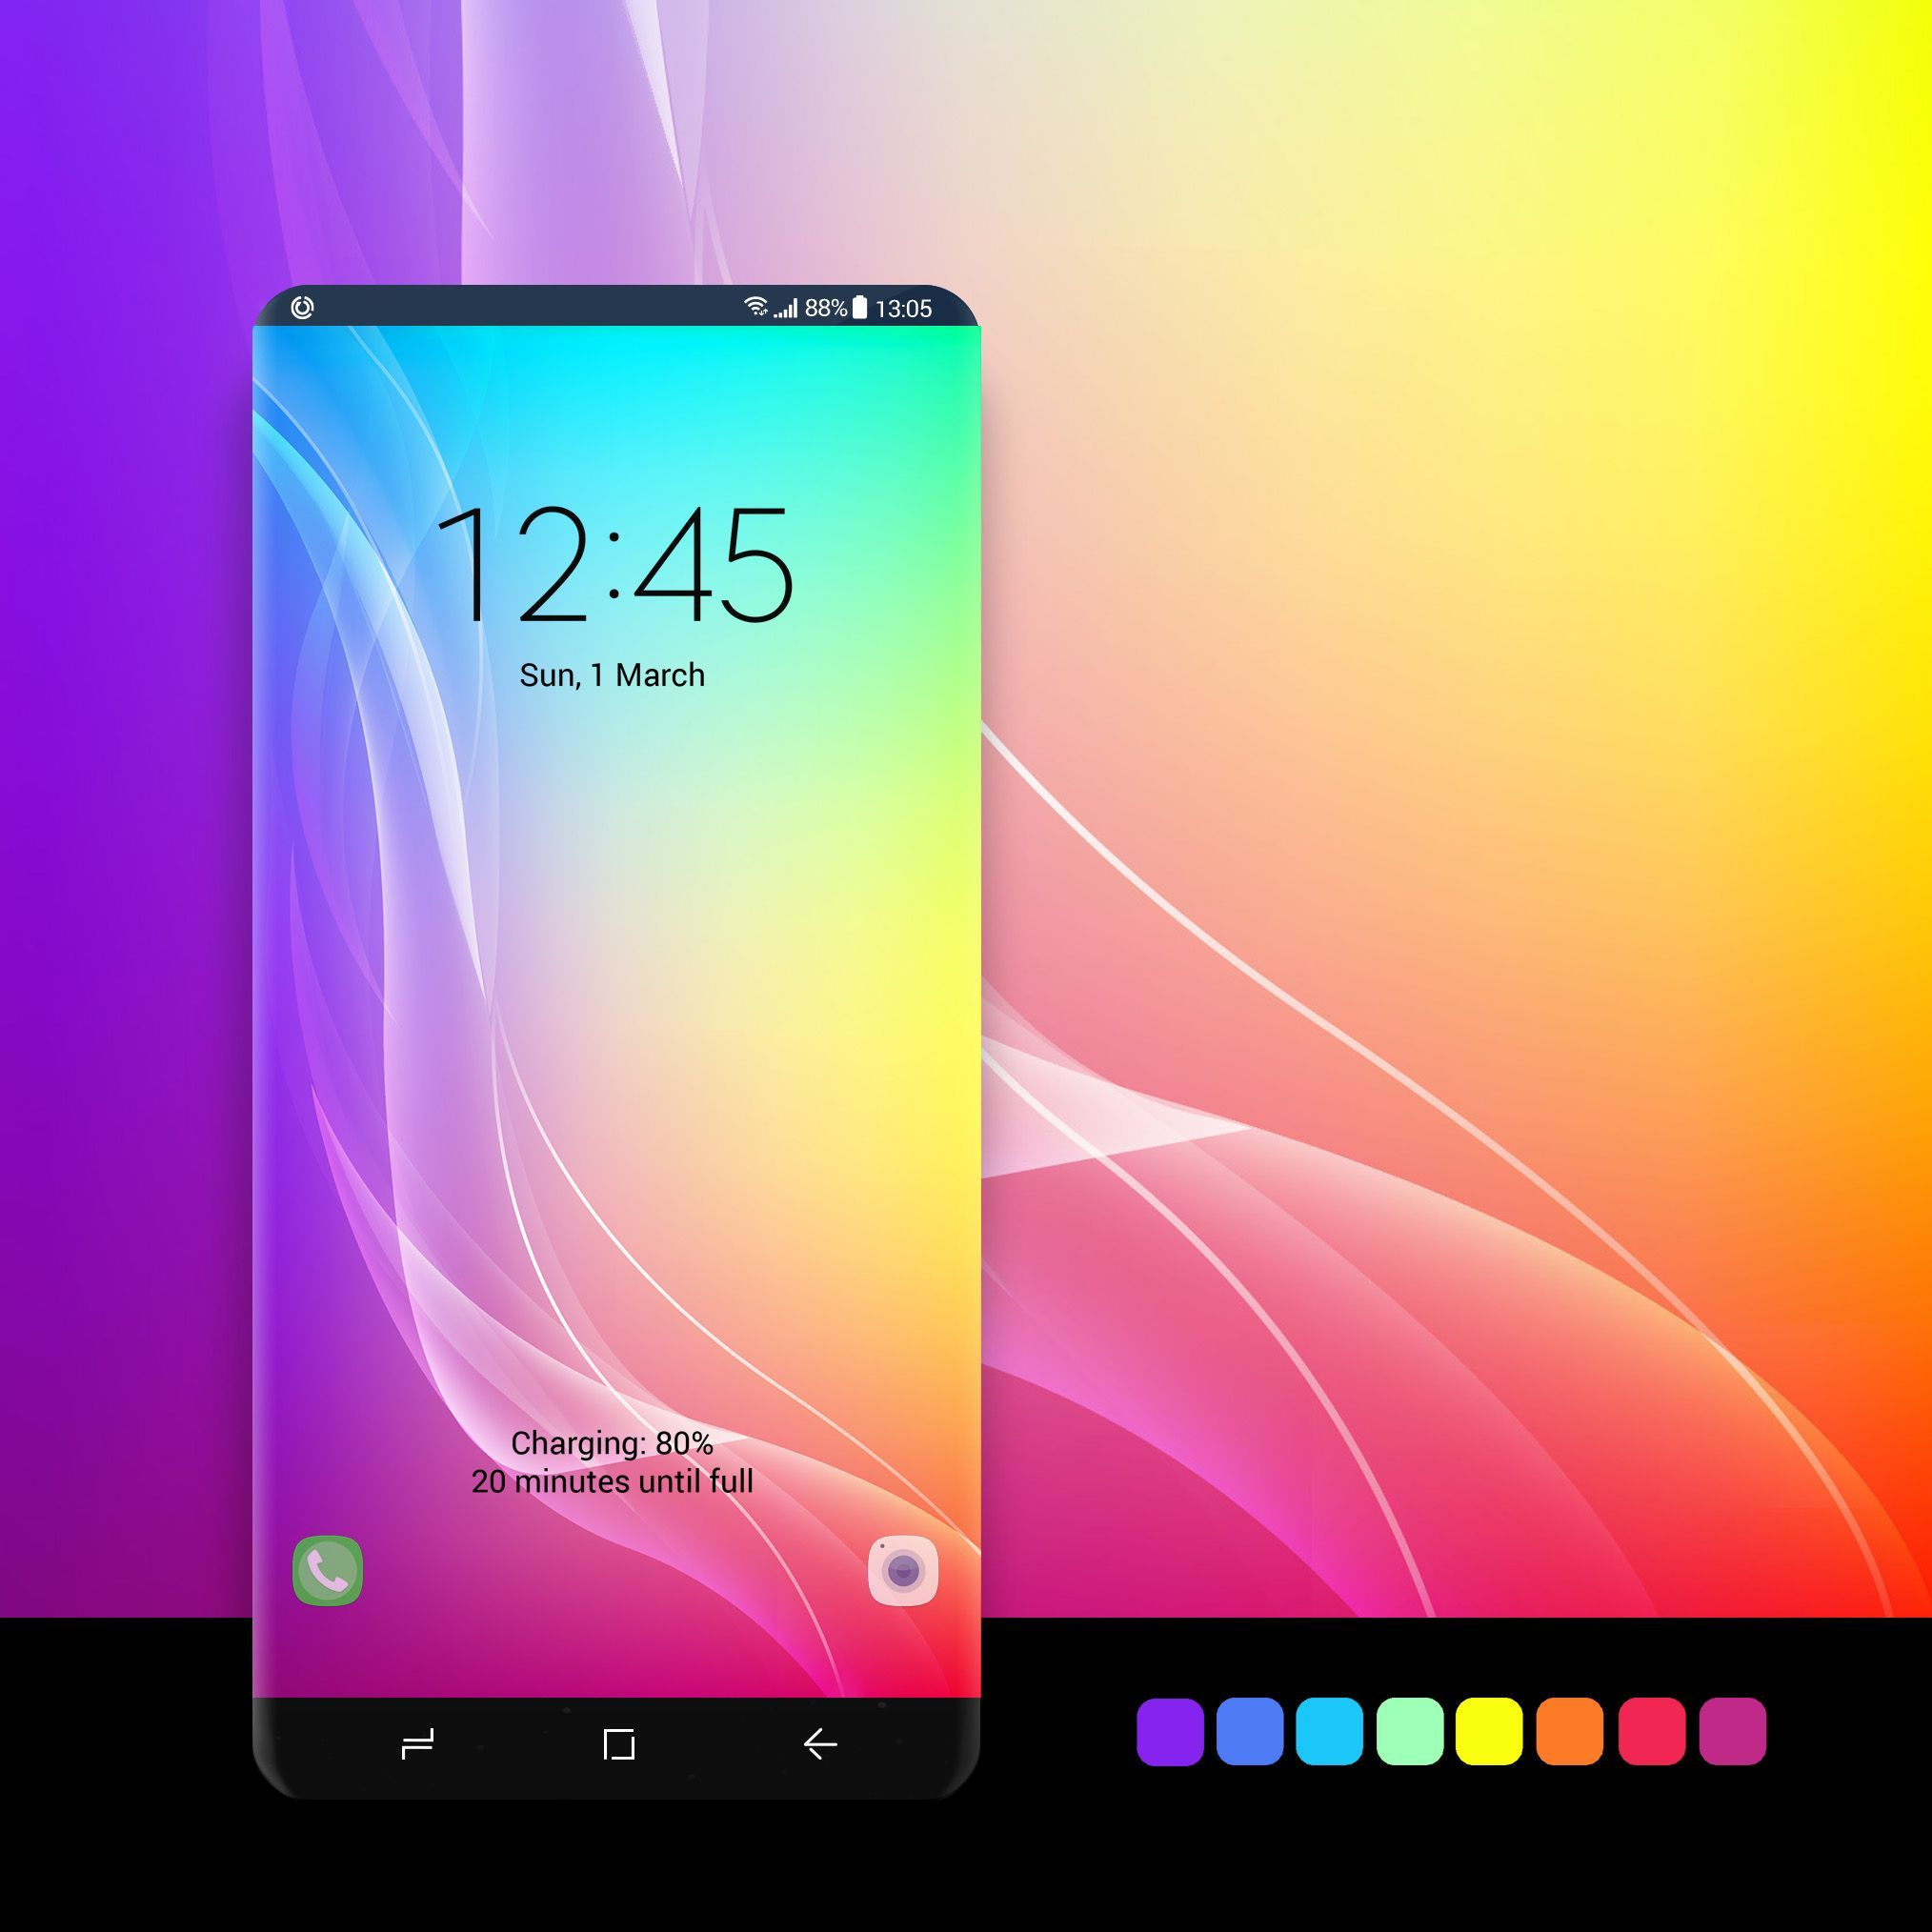 Rainbow Wallpaper In 2020 Samsung Galaxy Wallpaper Android Samsung Galaxy Wallpaper Samsung Wallpaper